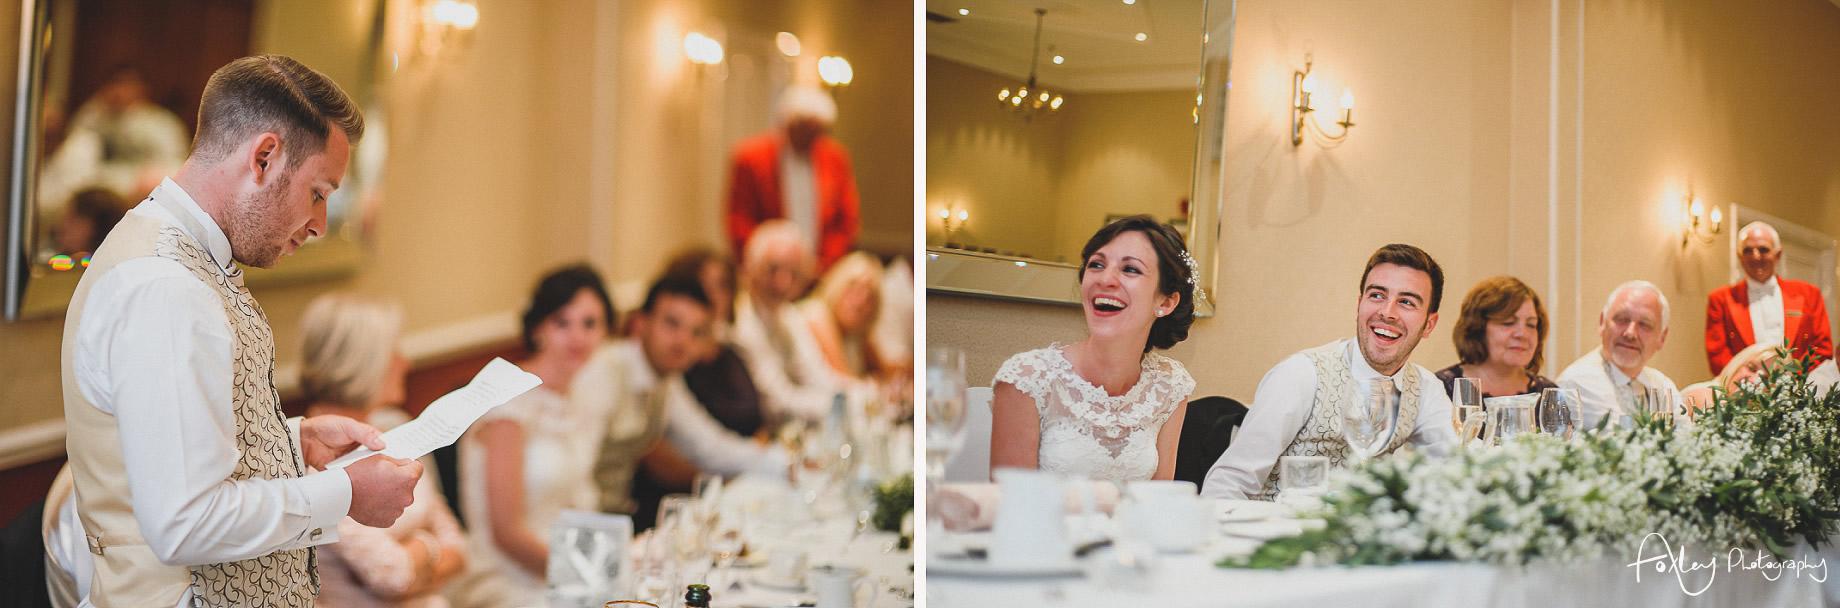 Rebecca and Dan Wedding at Preston Marriott Hotel 129